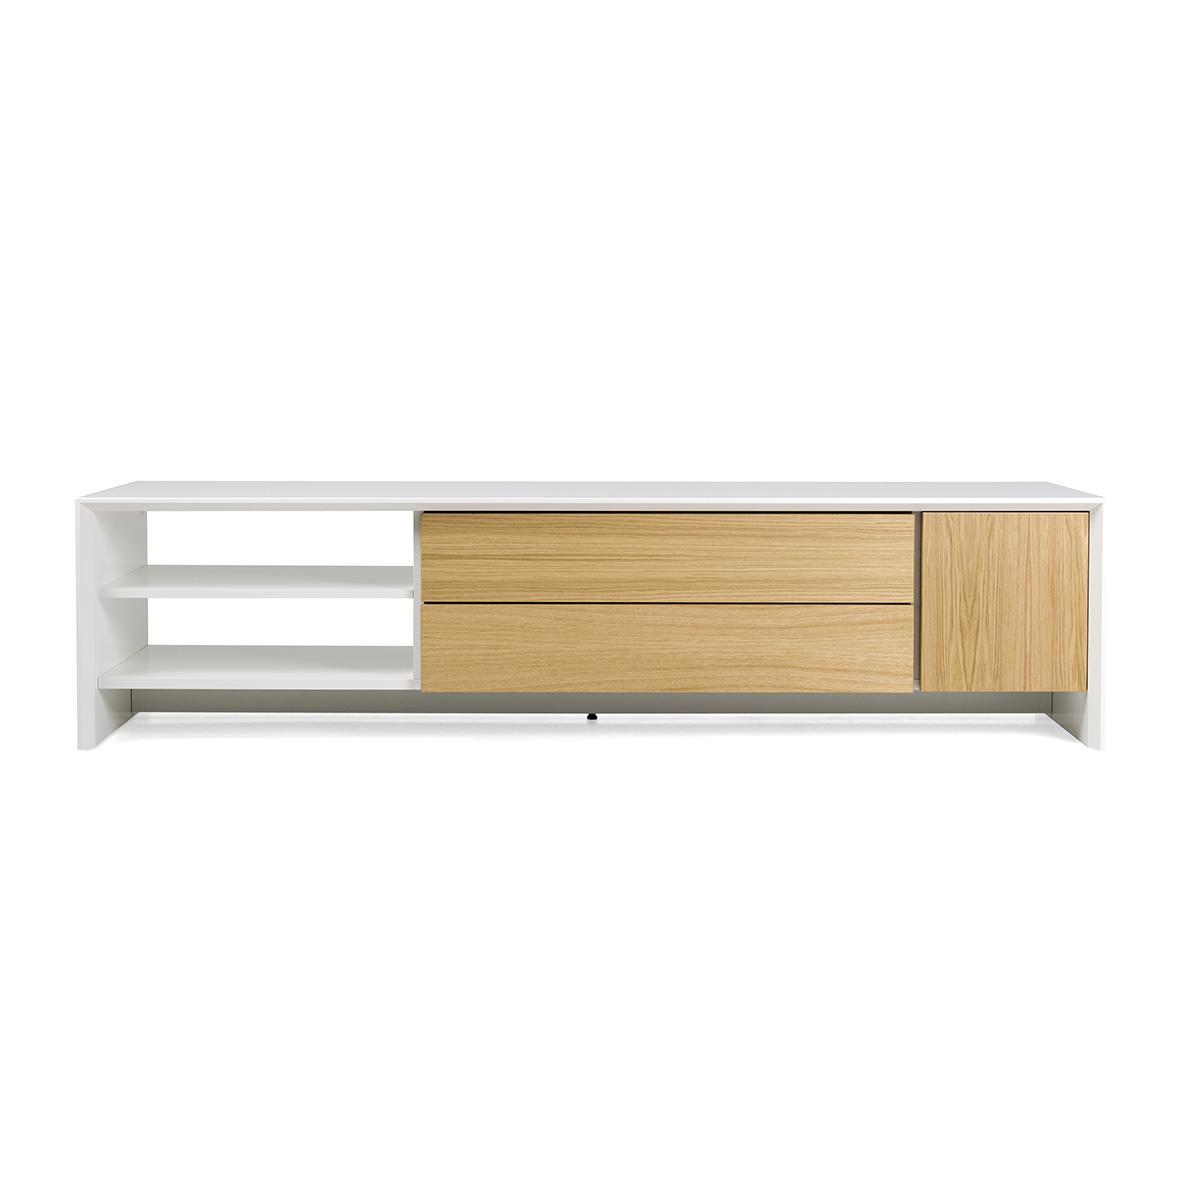 Meuble TV PROFIL Tenzo 180cm blanc et chêne